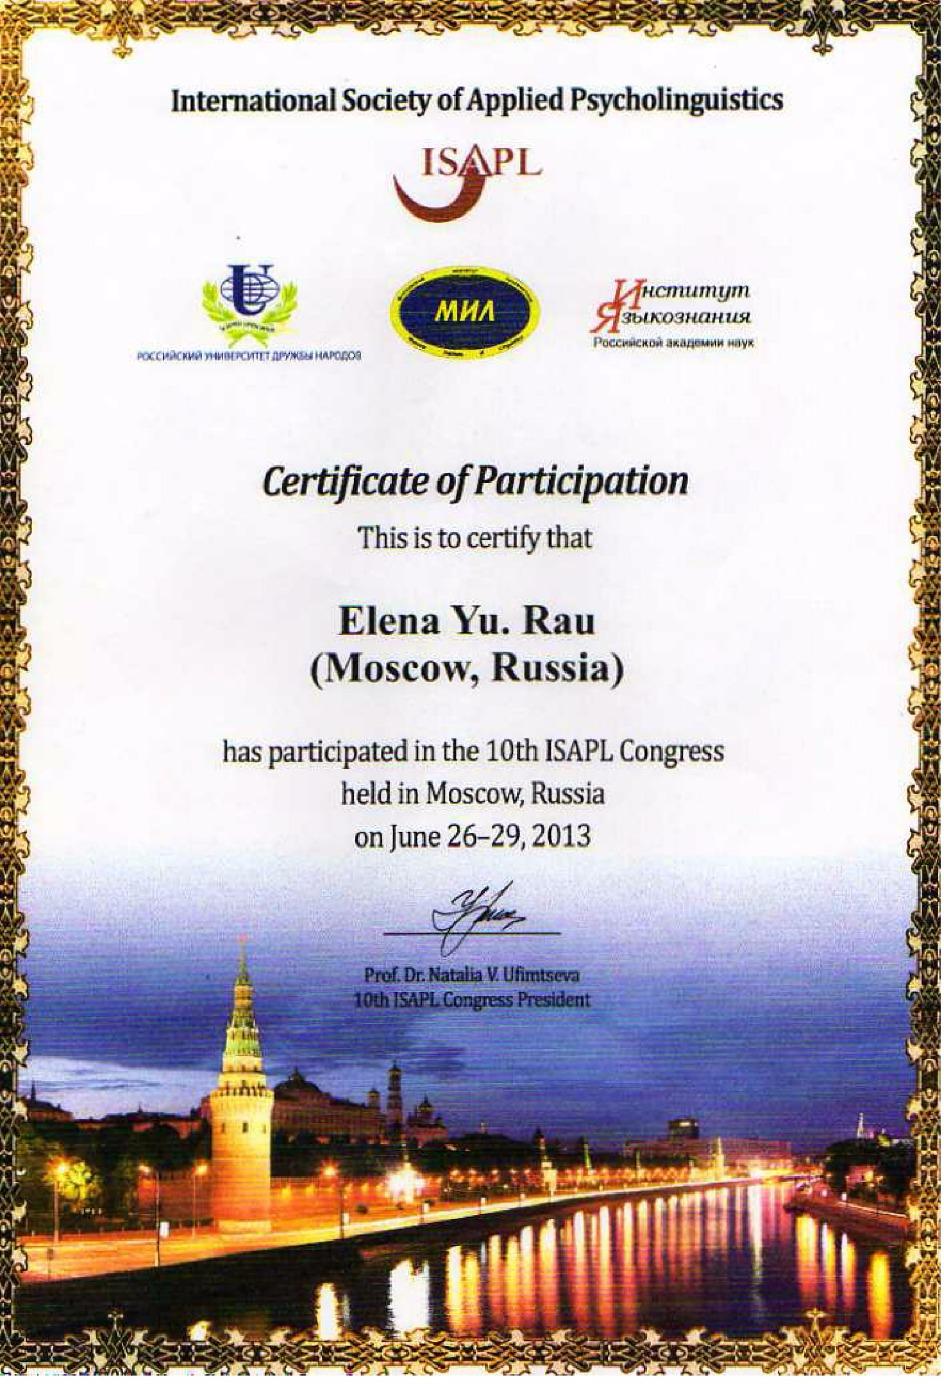 Сертифт 2012ика-1_edited